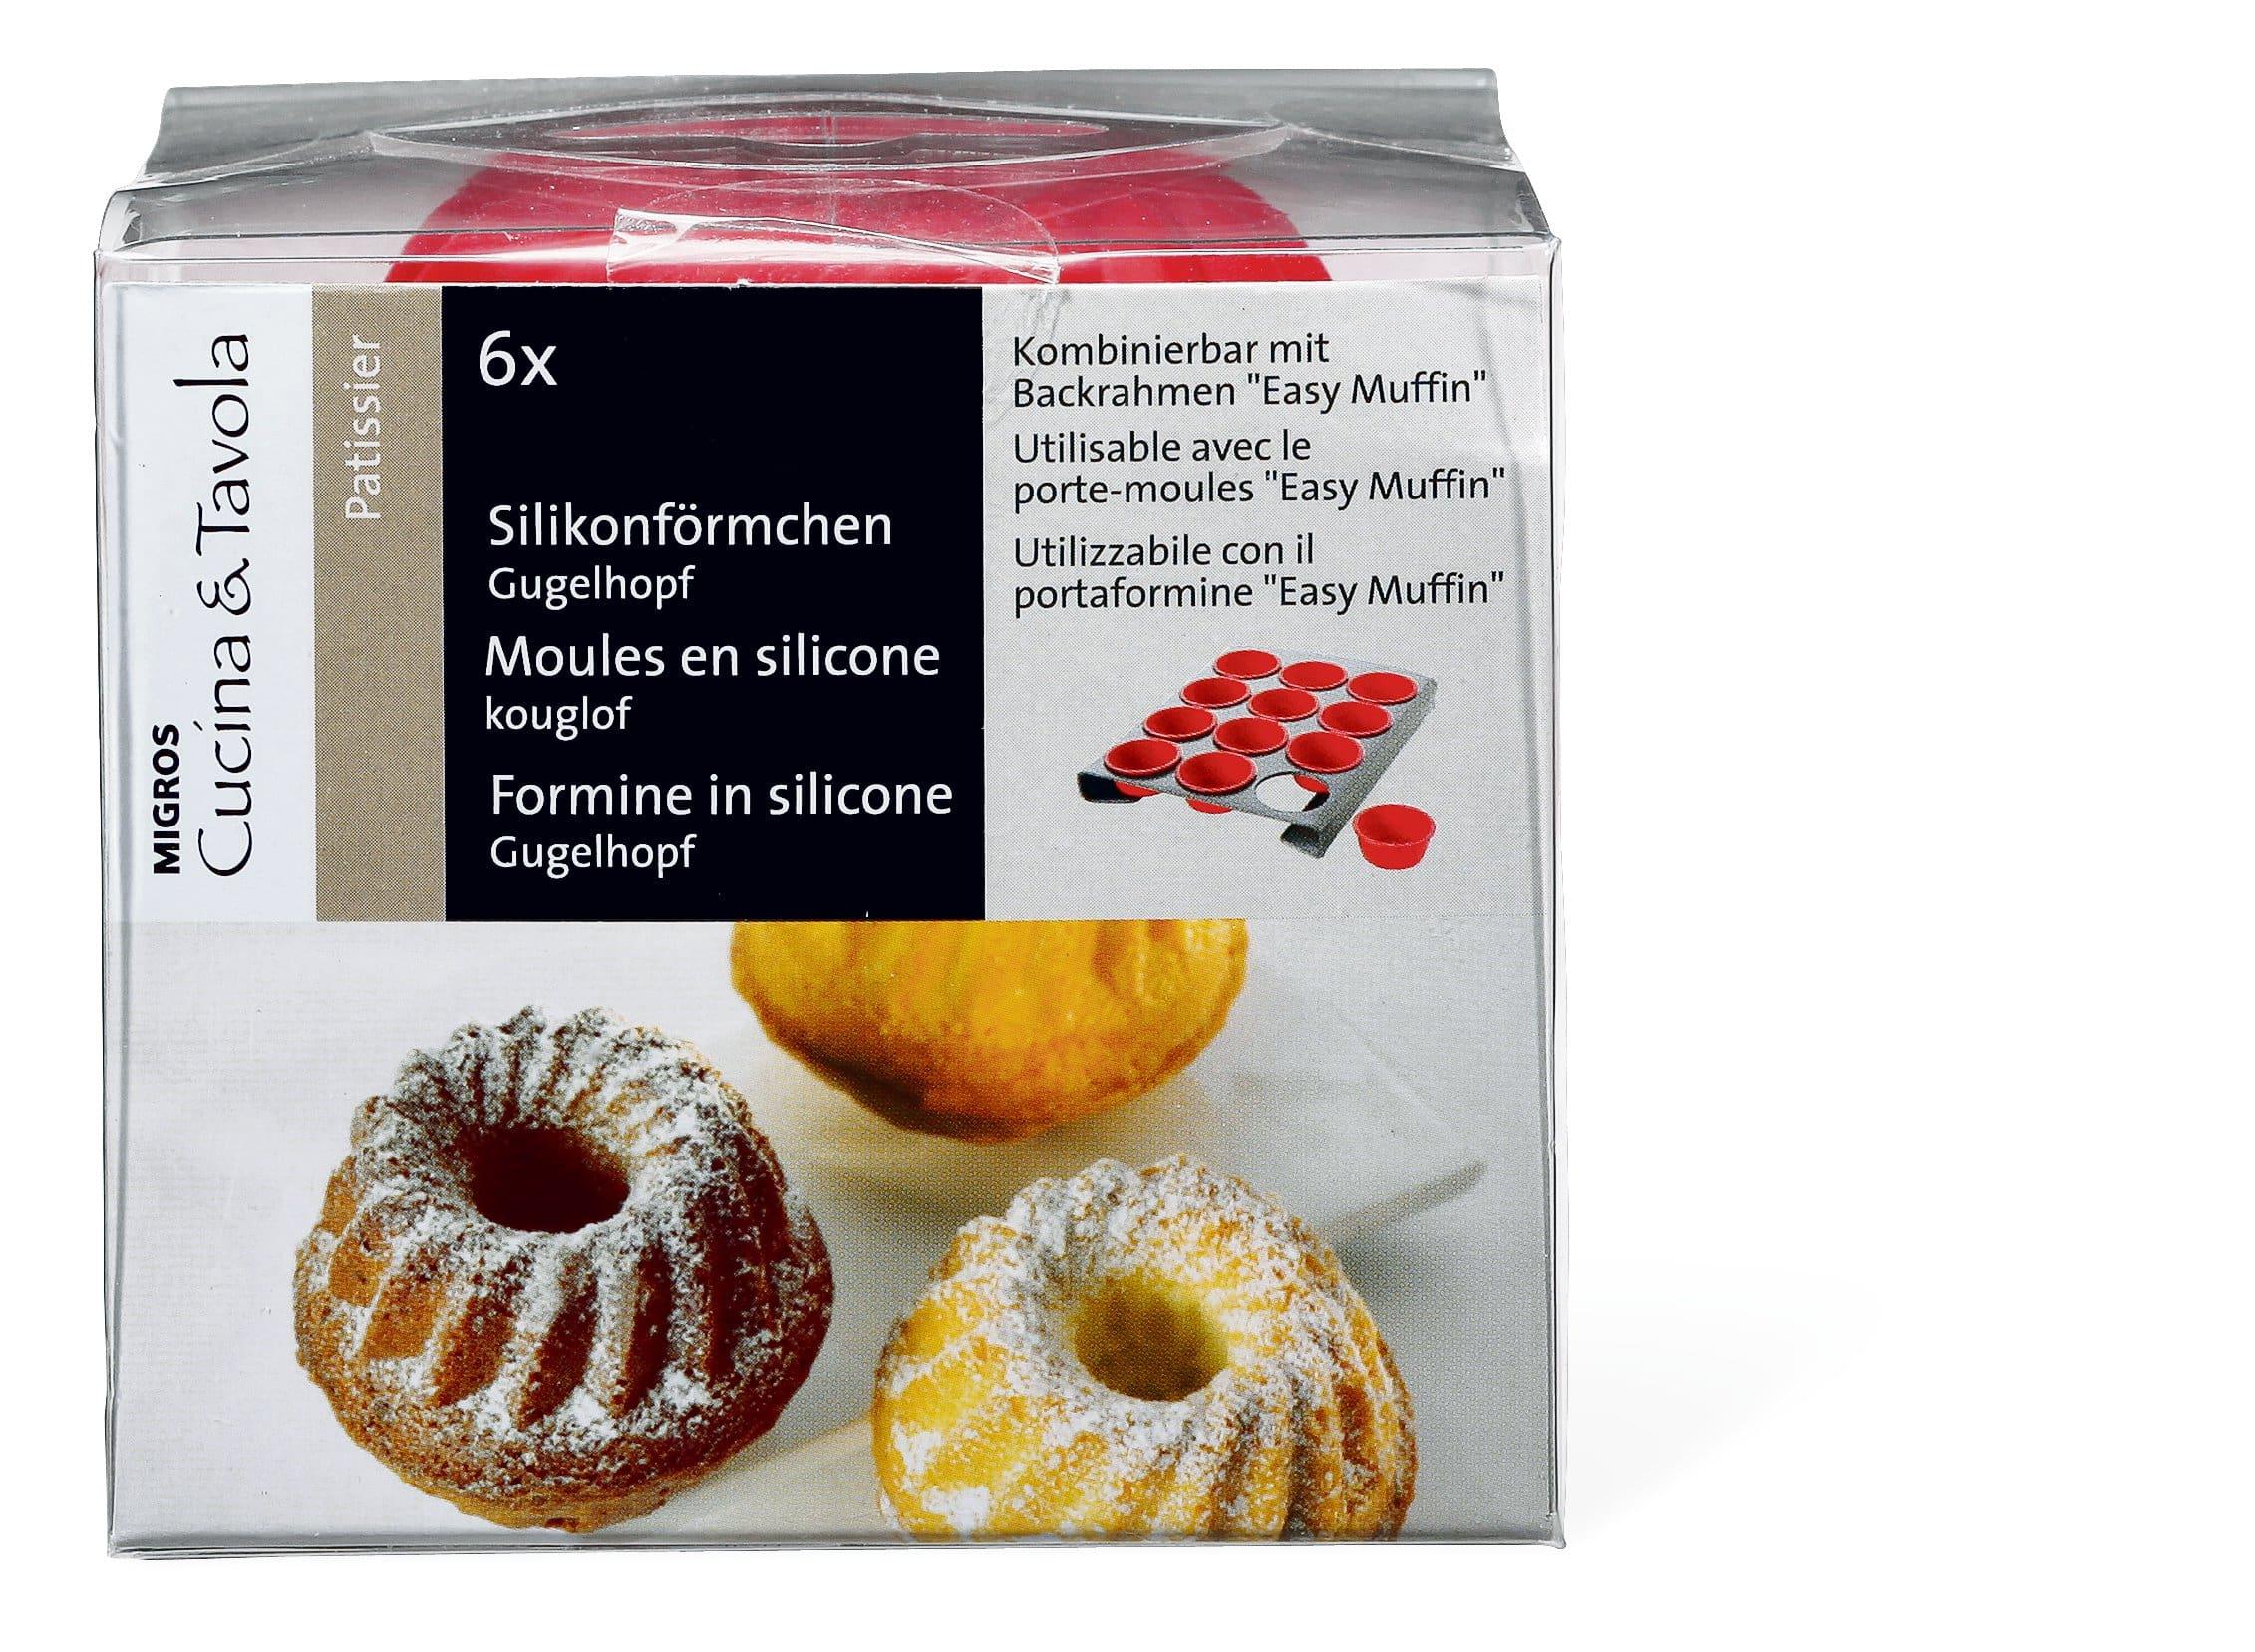 Cucina & Tavola Formine in silicone gugelhopf